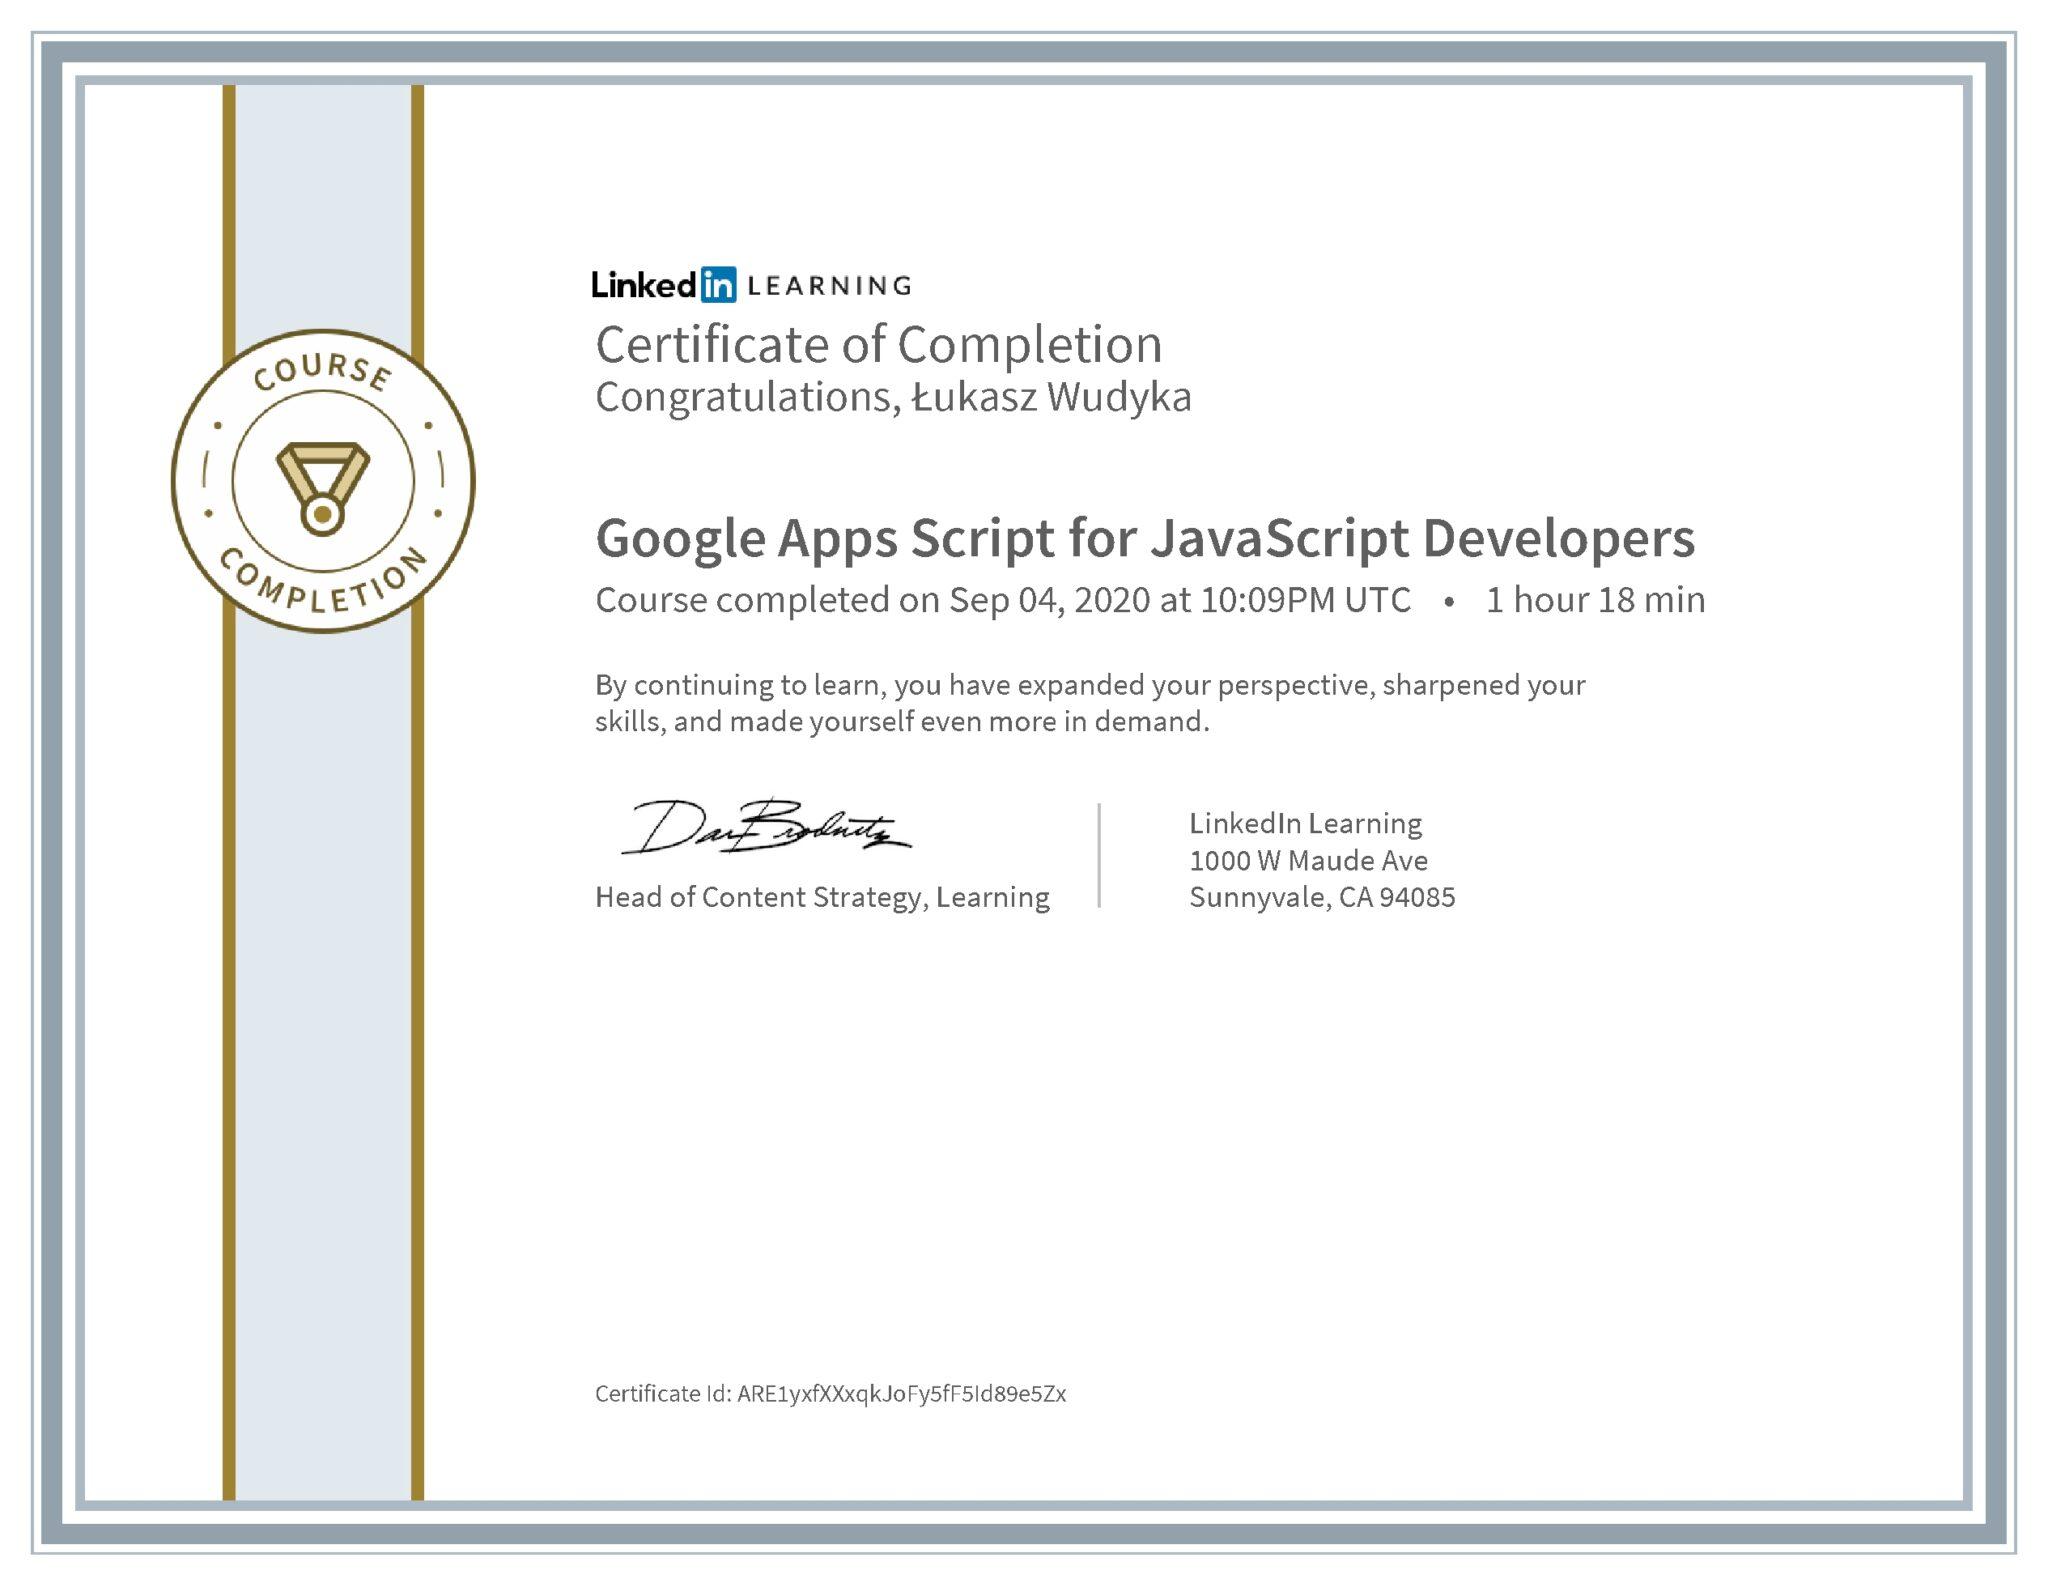 Łukasz Wudyka certyfikat LinkedIn Google Apps Script for JavaScript Developers